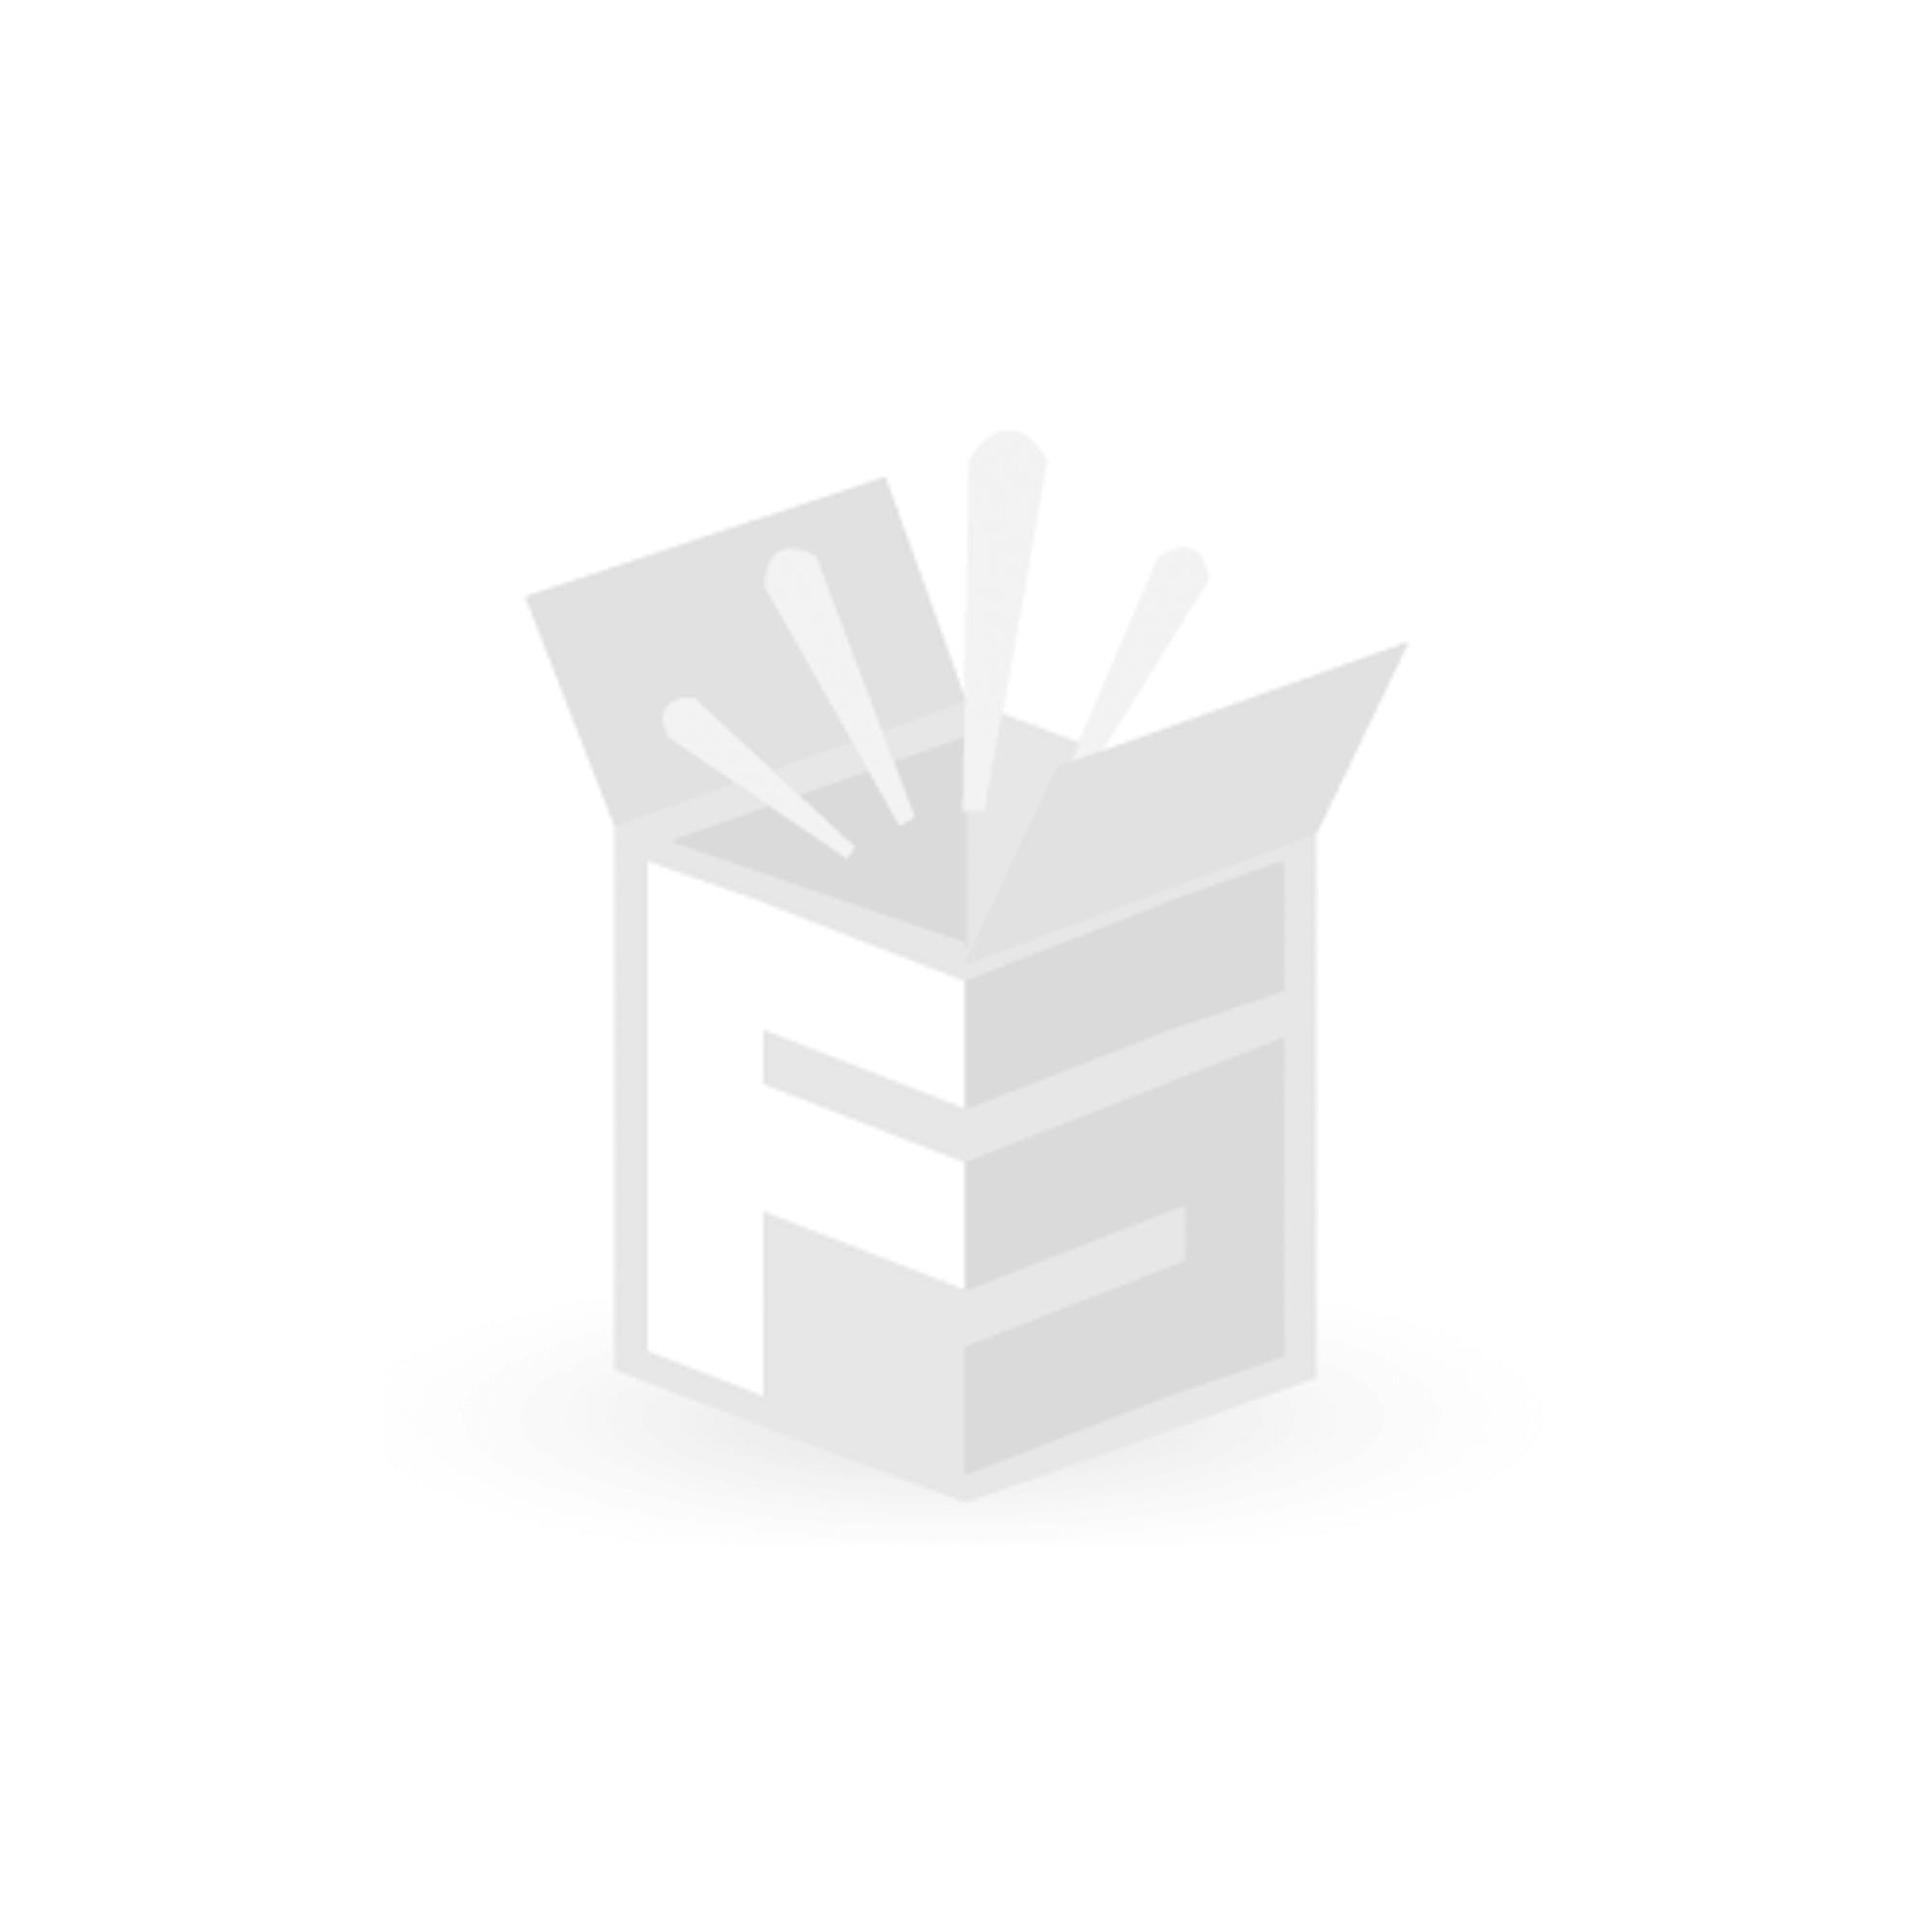 Blaumann 3-teiliges Lunchbox-Set Edelstahl 3x 1L